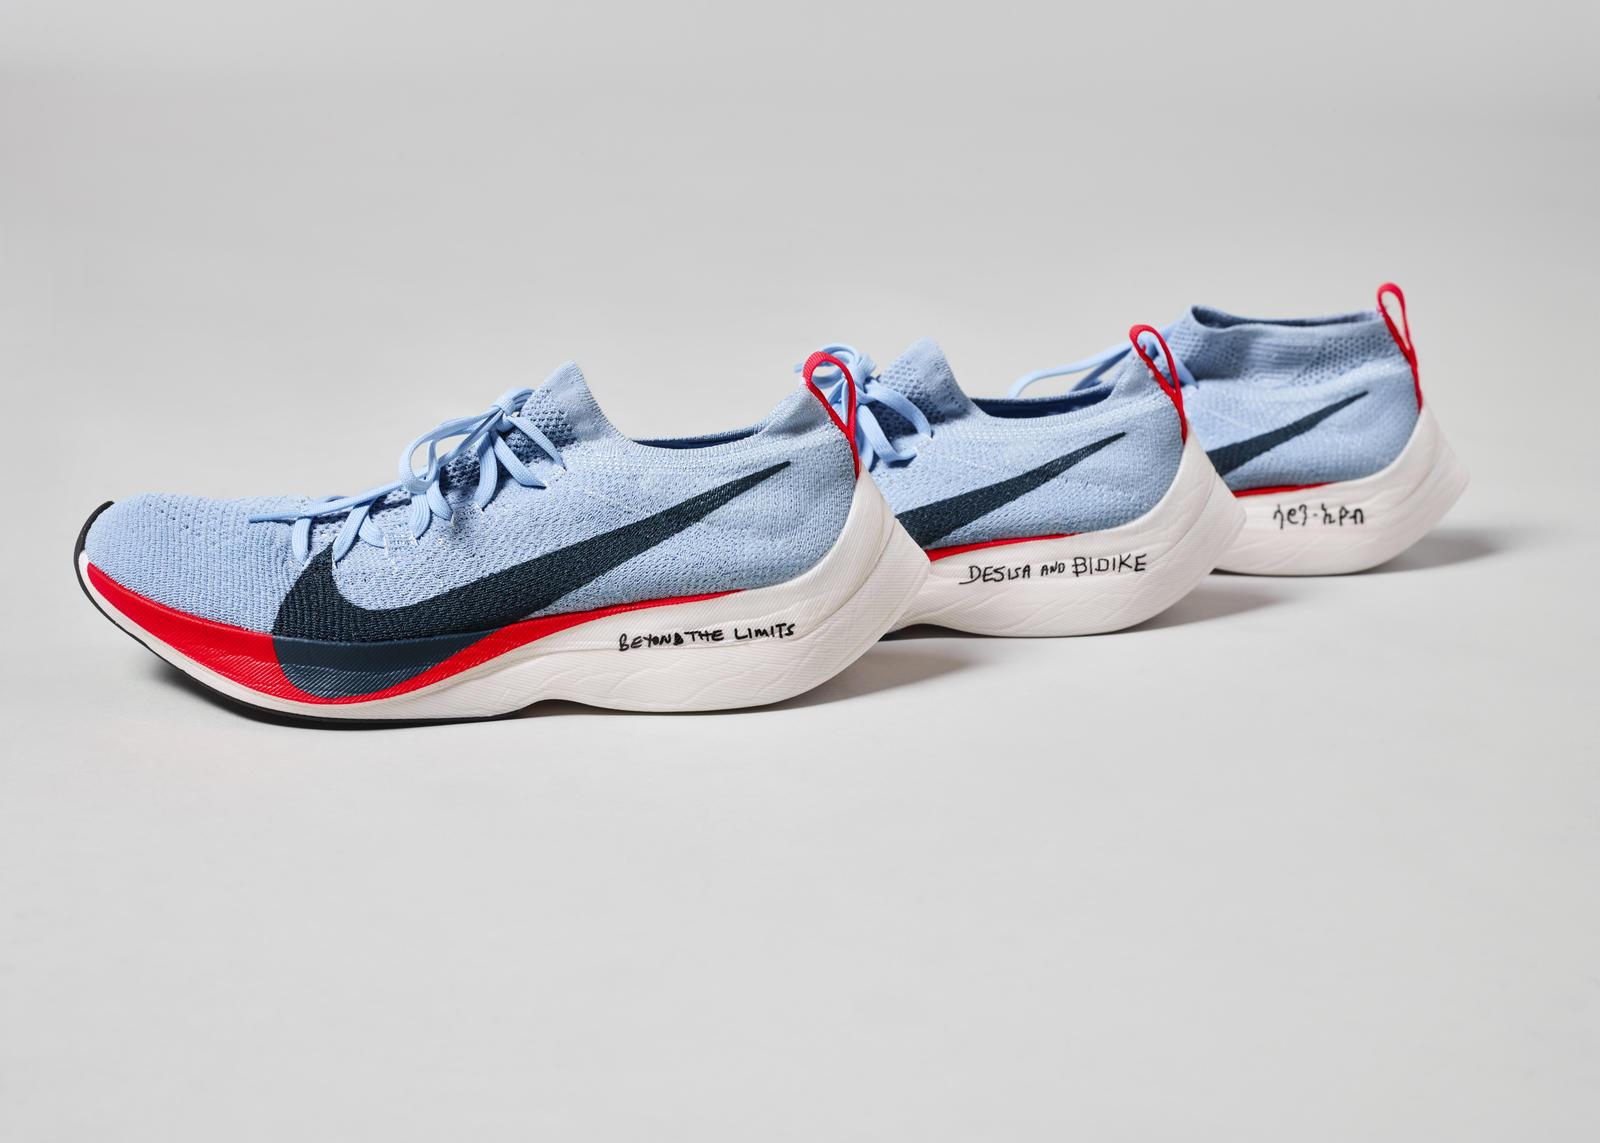 New Nike Running Shoes June